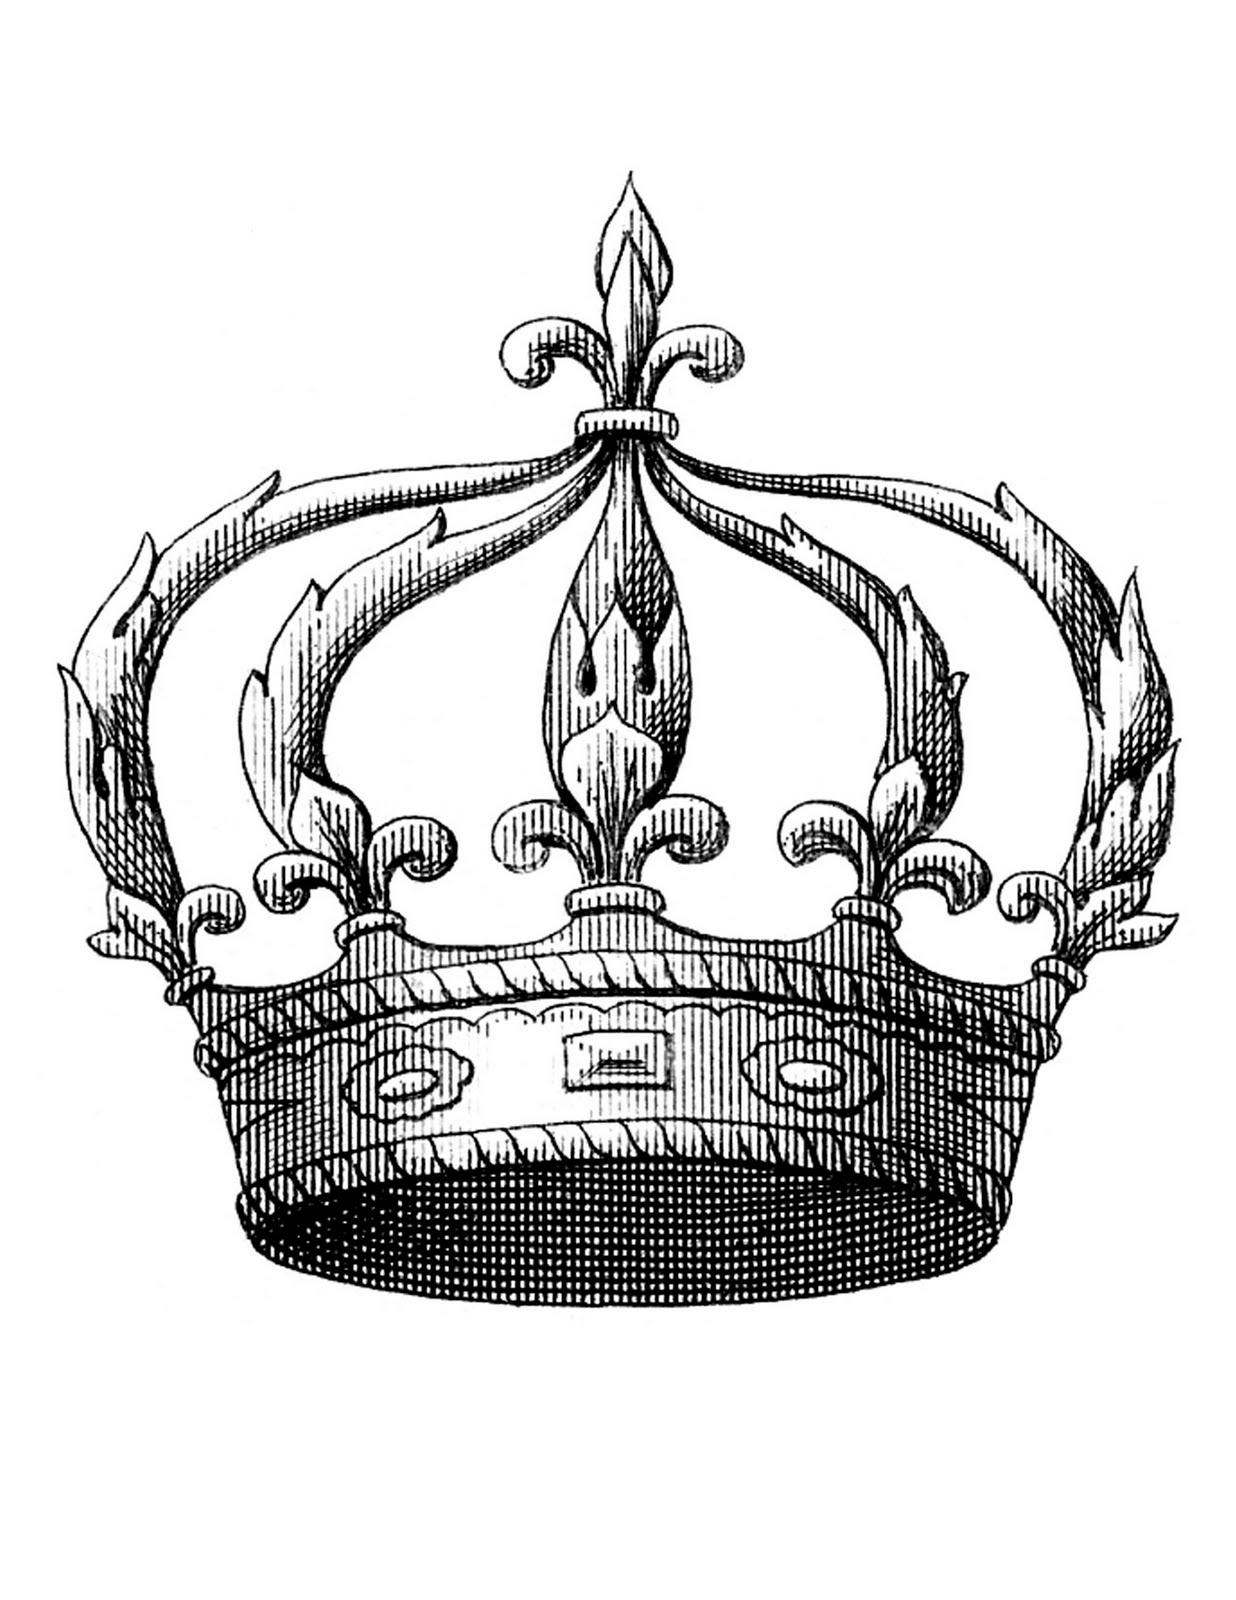 Princess Crown Silhouette Clip Art At Getdrawings